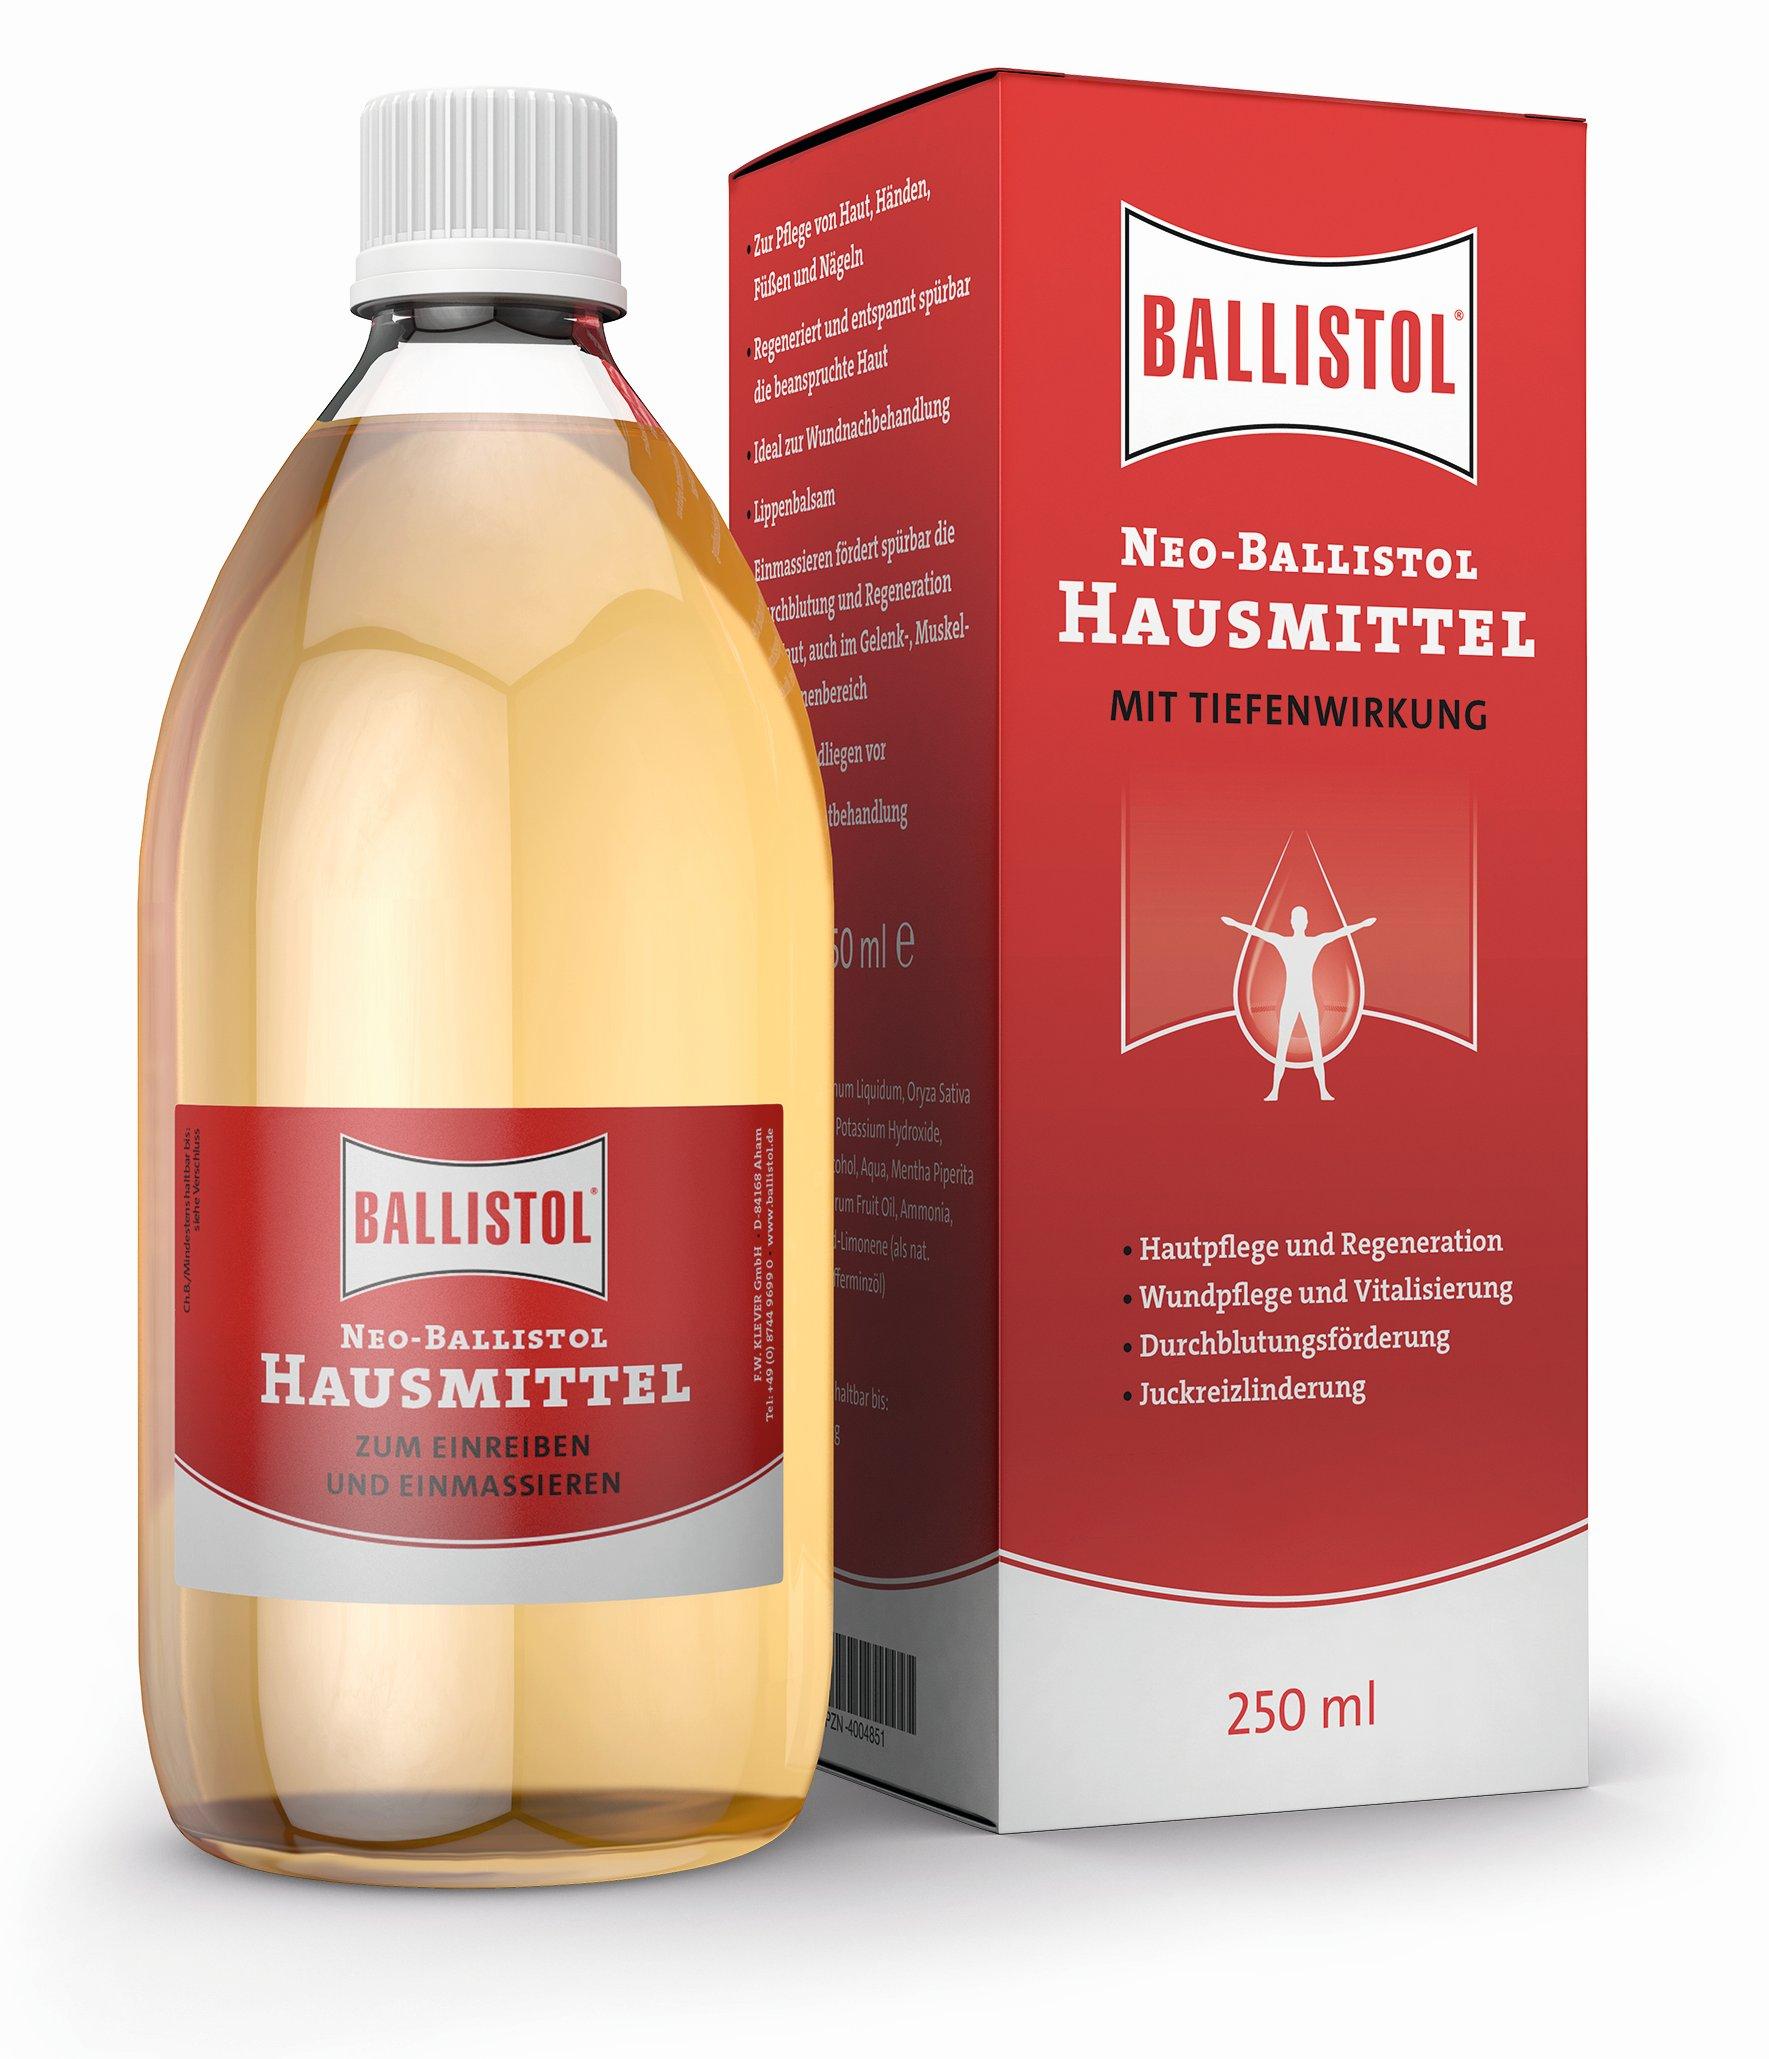 BALLISTOL huismiddeltje, 250 ml - De geheime tip onder huismiddeltjes